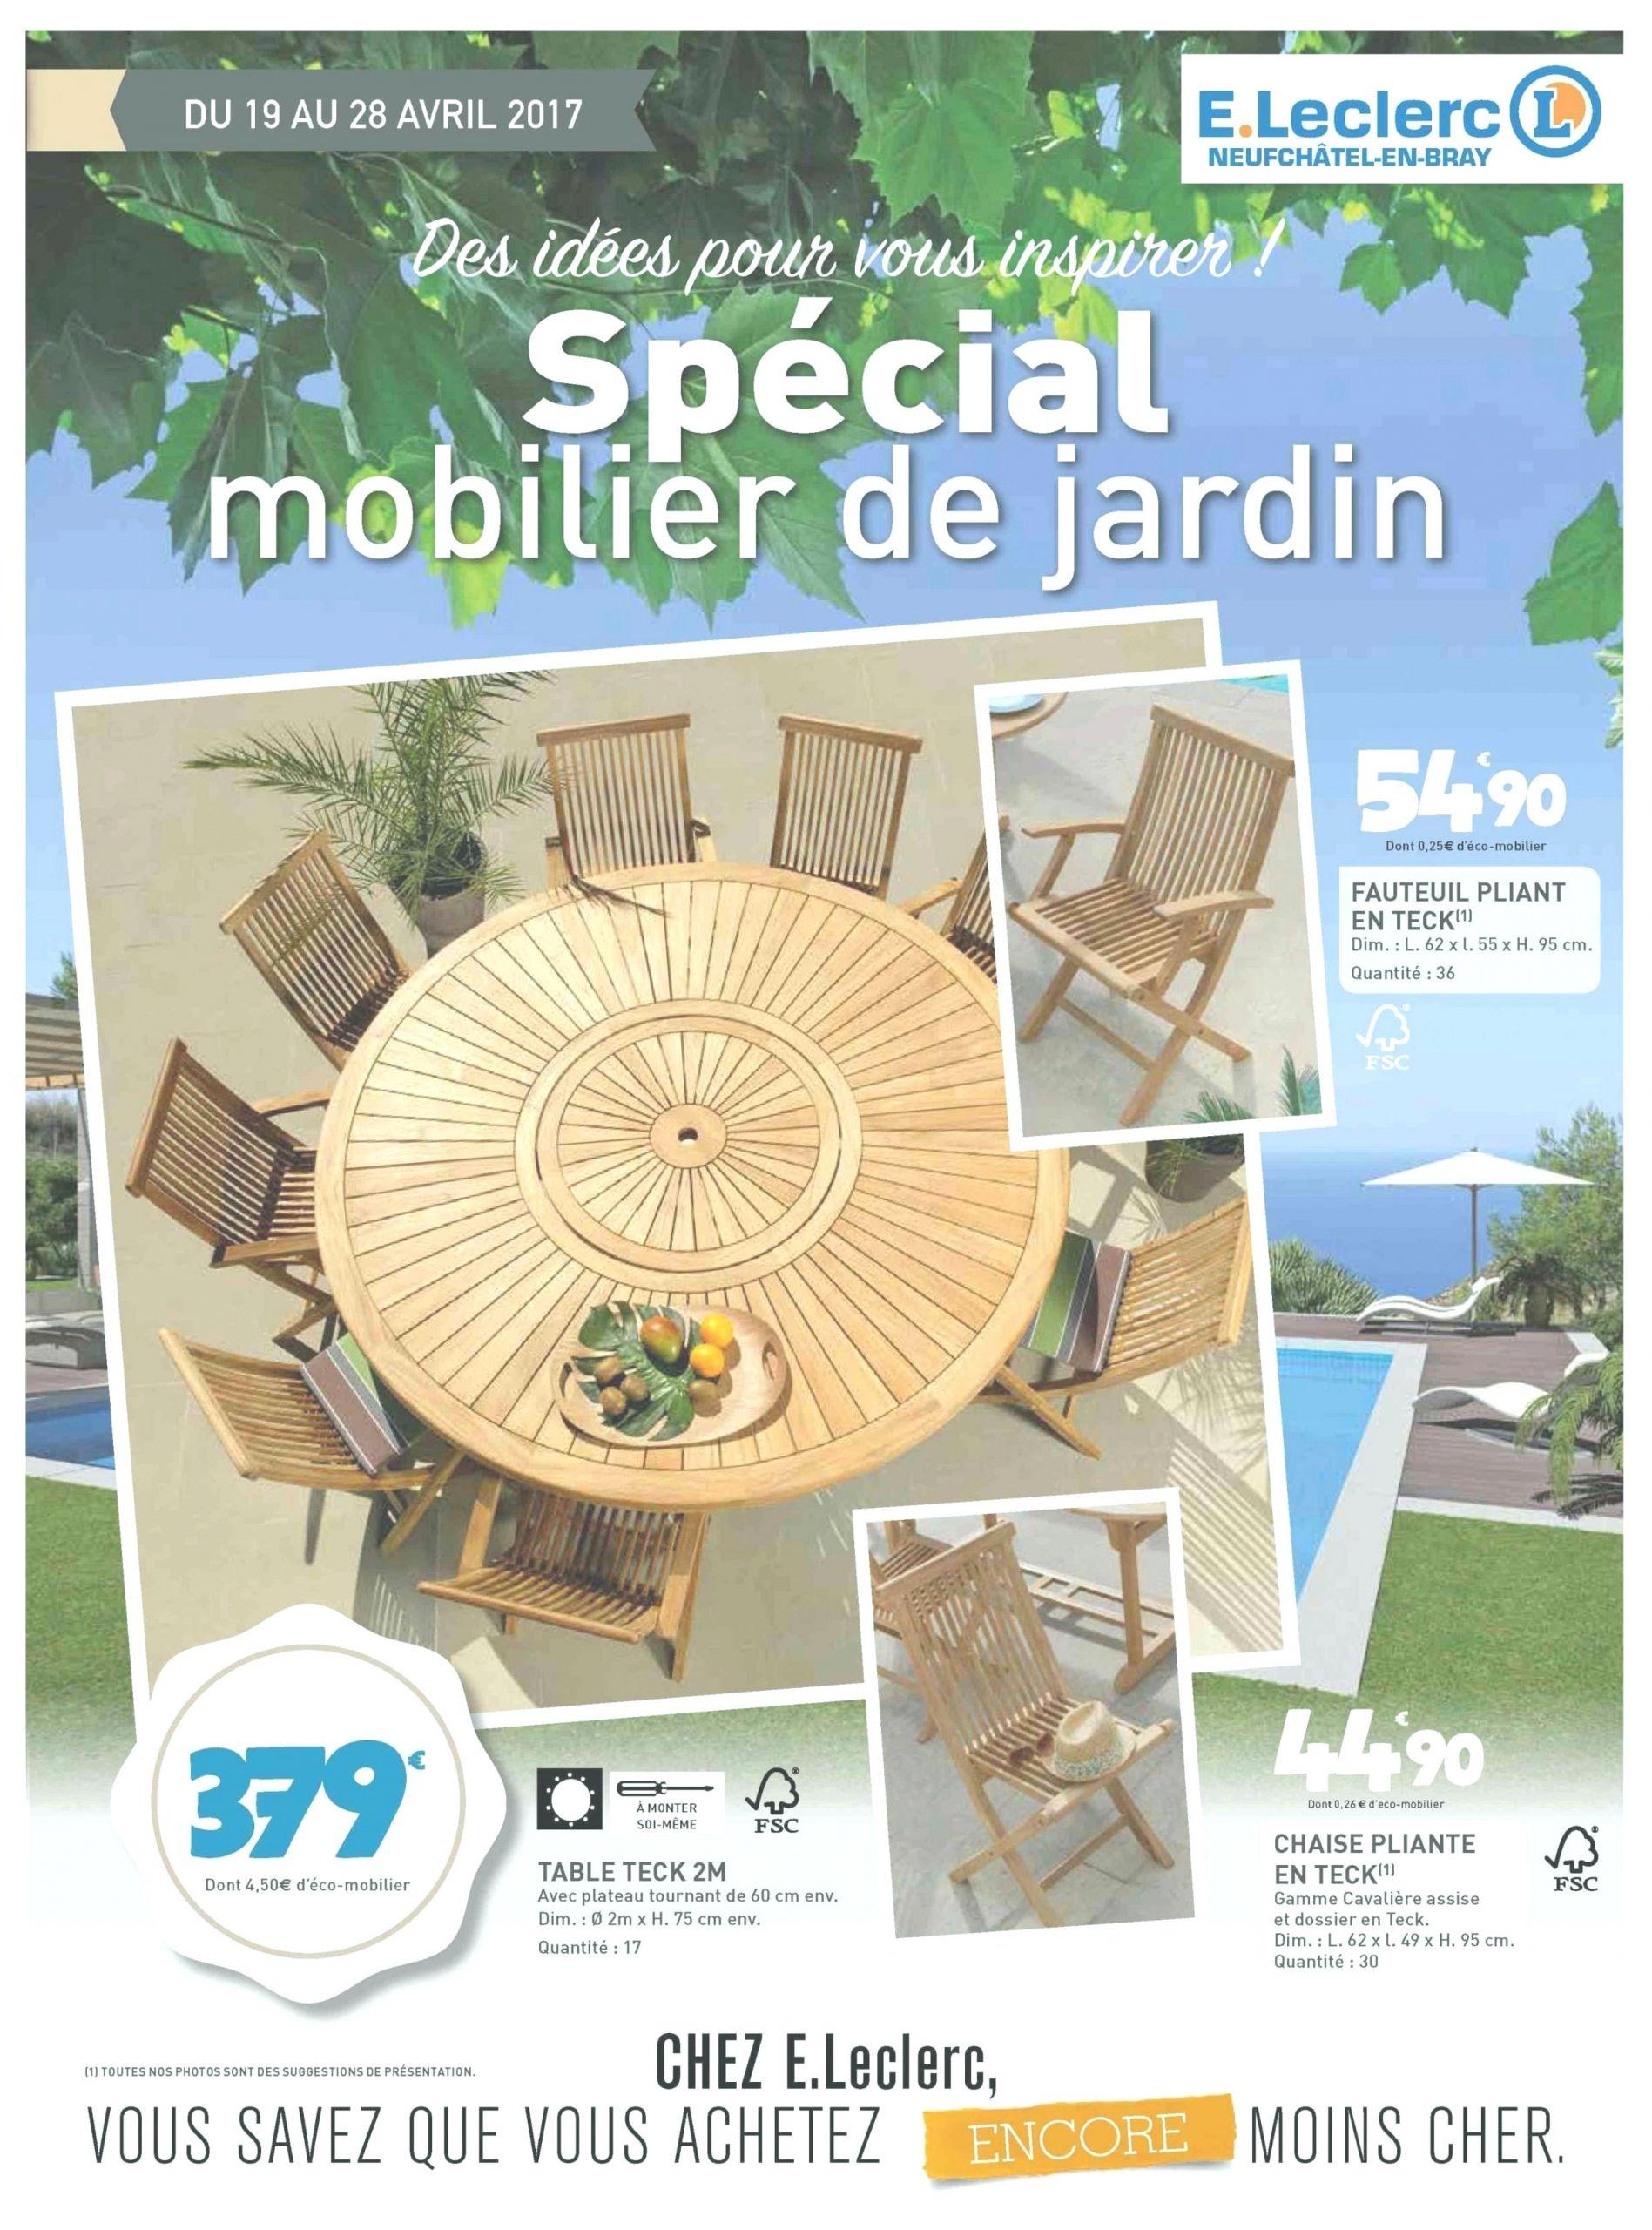 Brico Stock Best Of 29 Concept Brico Depot Meuble | Salon Jardin encequiconcerne Mobilier Jardin Brico Depot